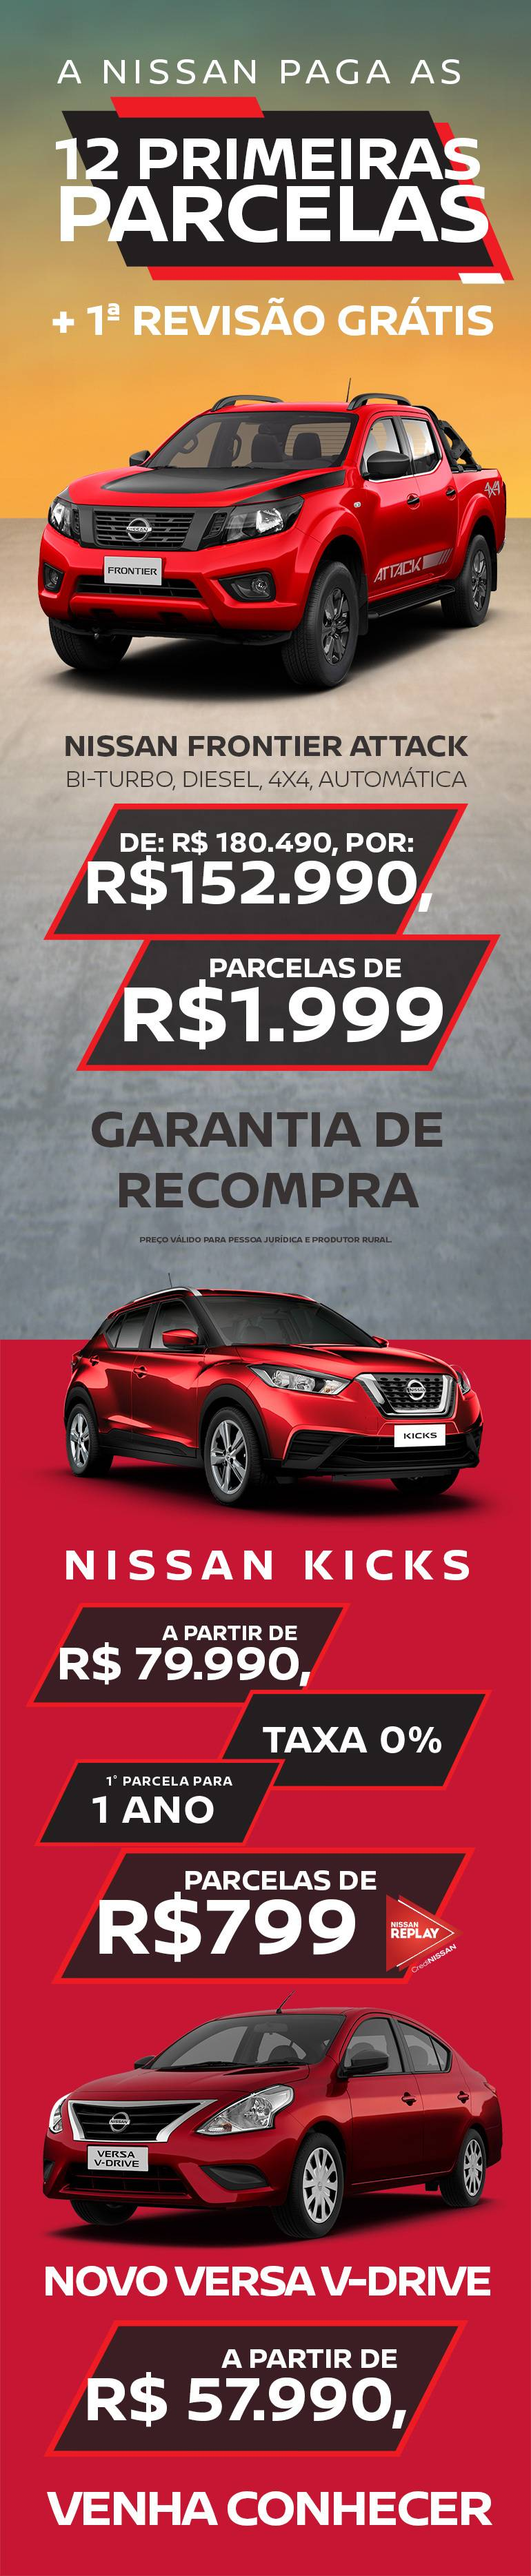 Nissan Frontier 0km